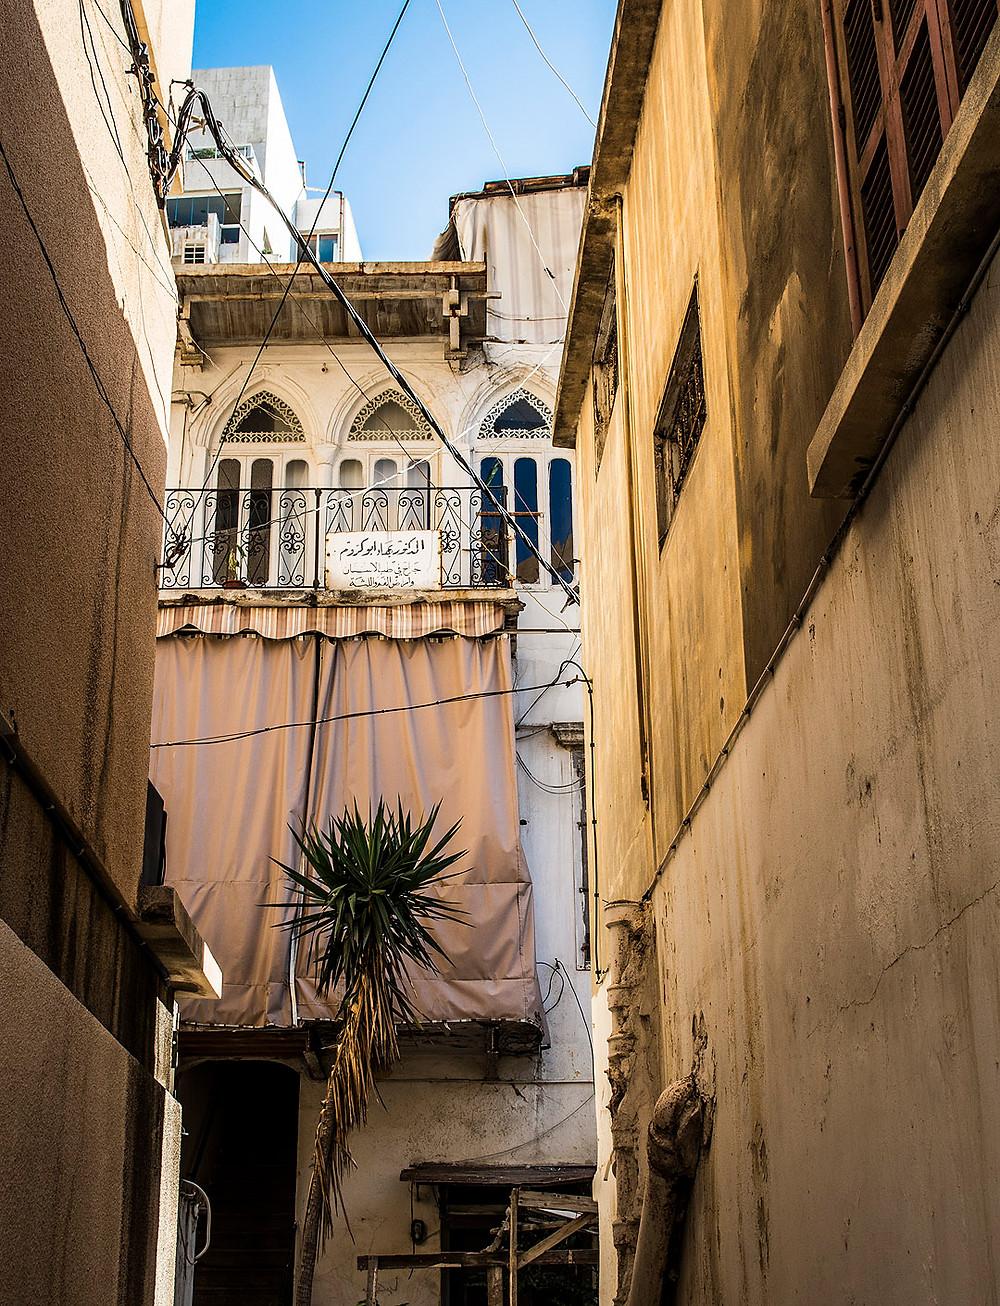 Alleyways in Ras Beirut, Lebanon